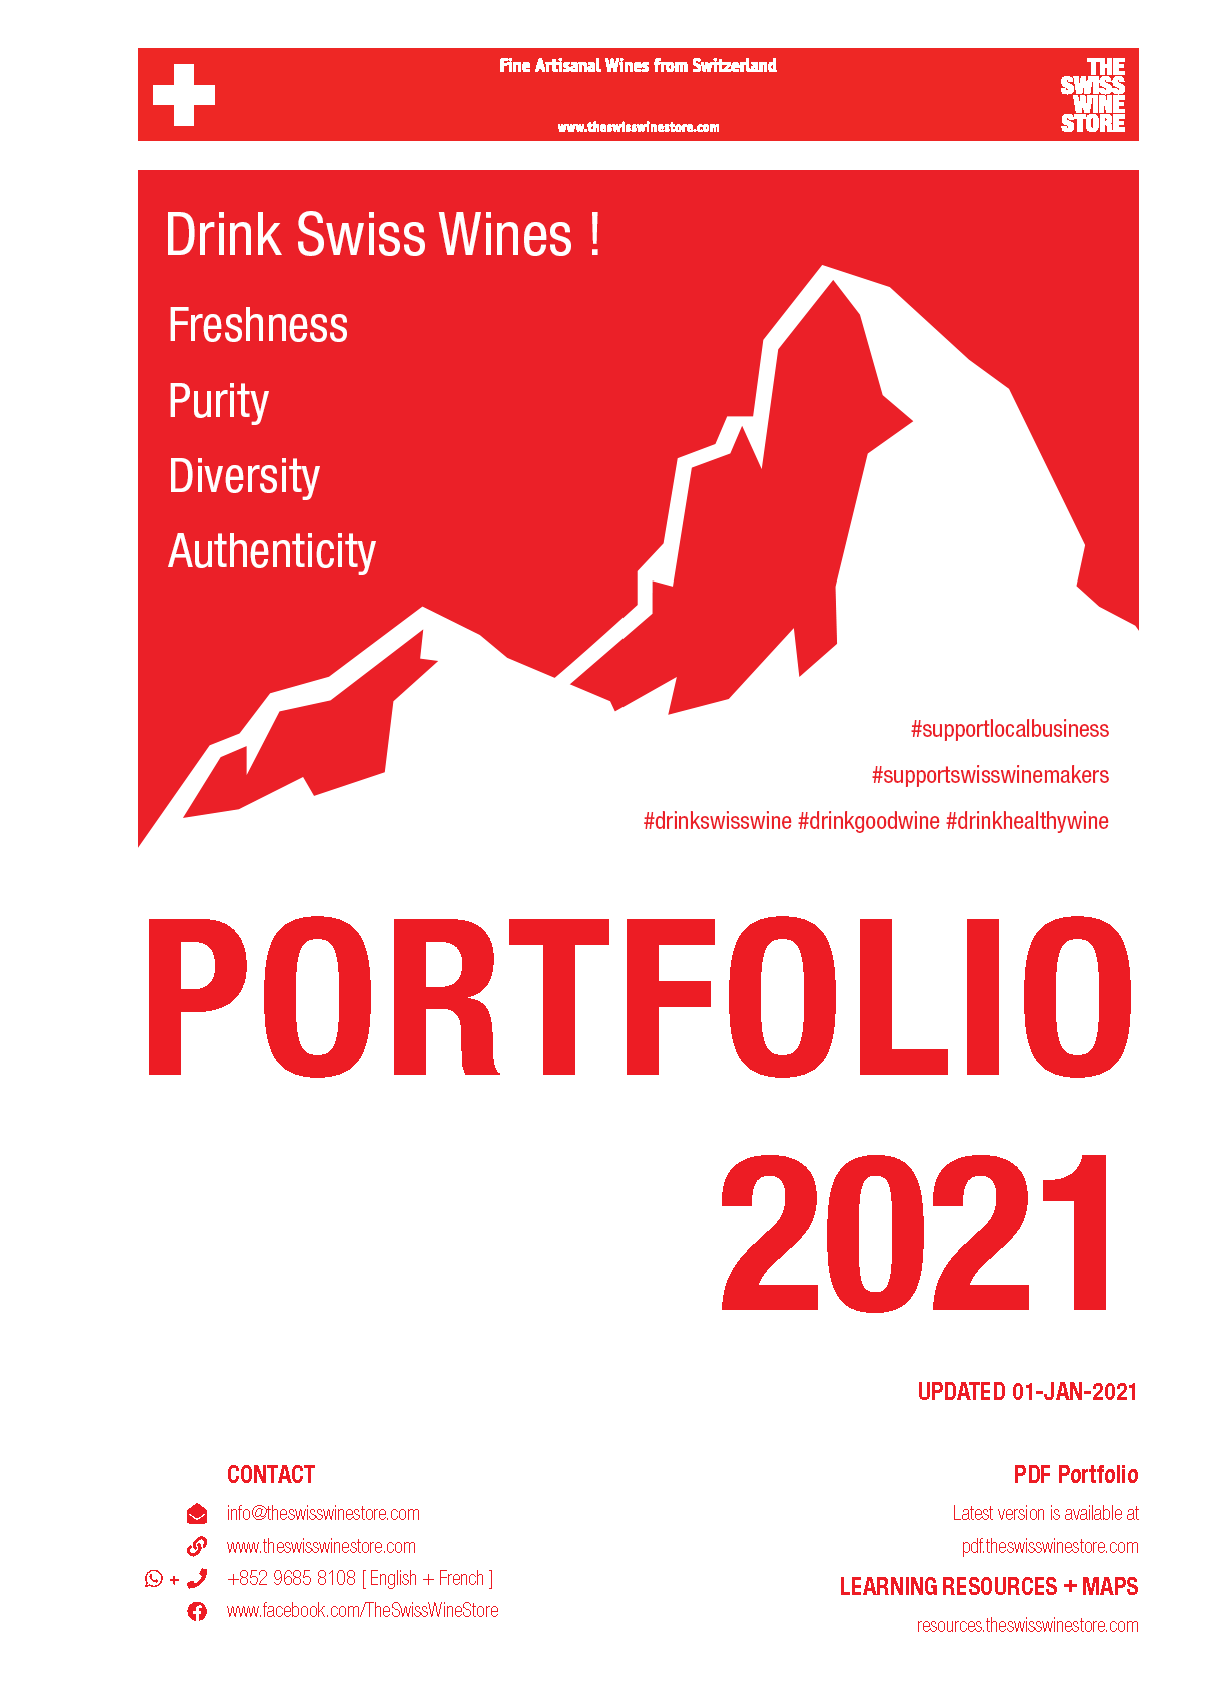 tsws_wine_portfolio_A4_2021-01.png